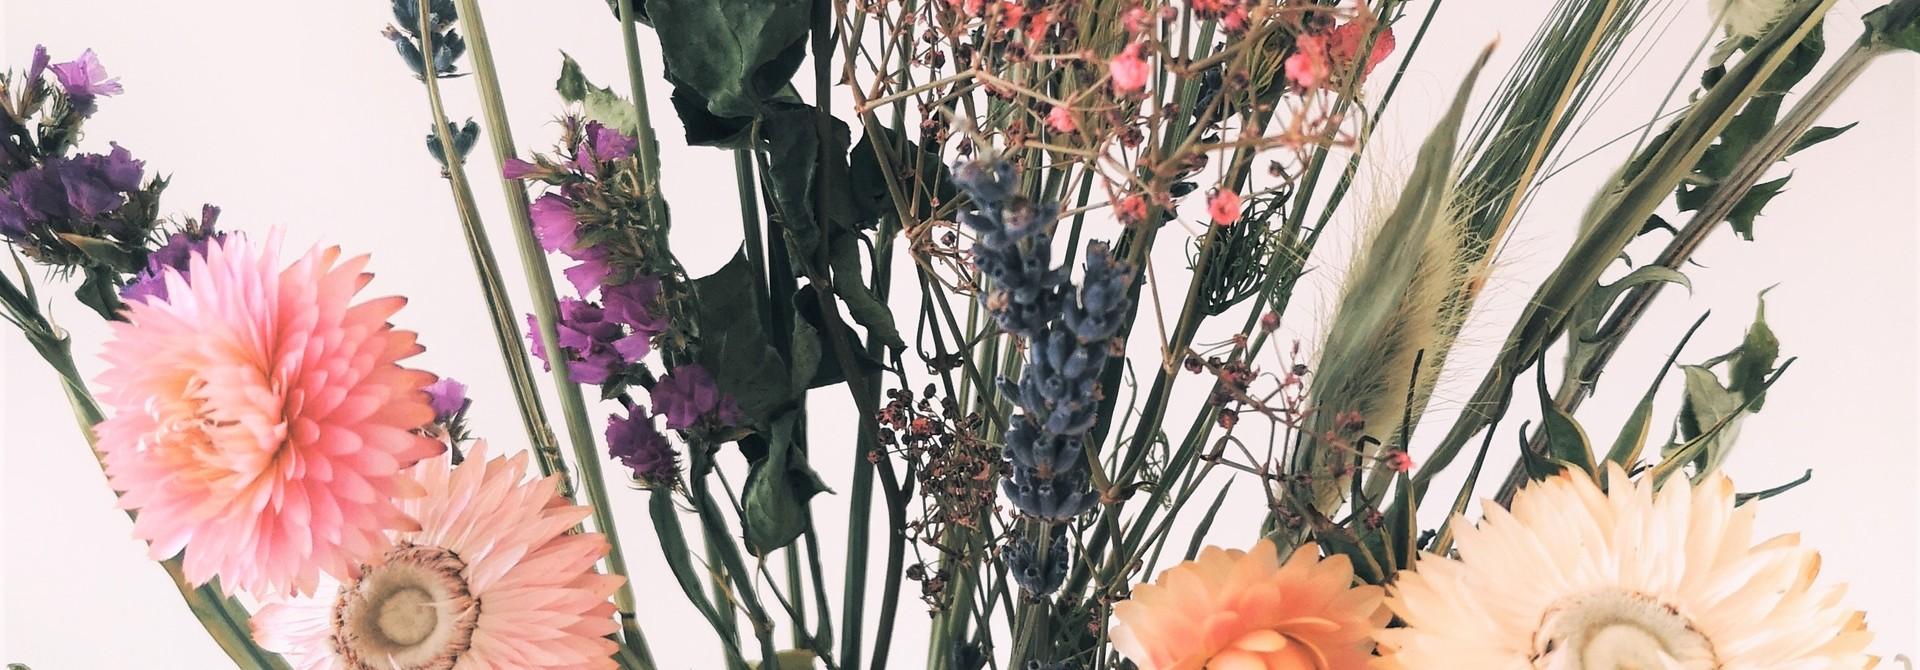 Wildflowers ROSINE - Large